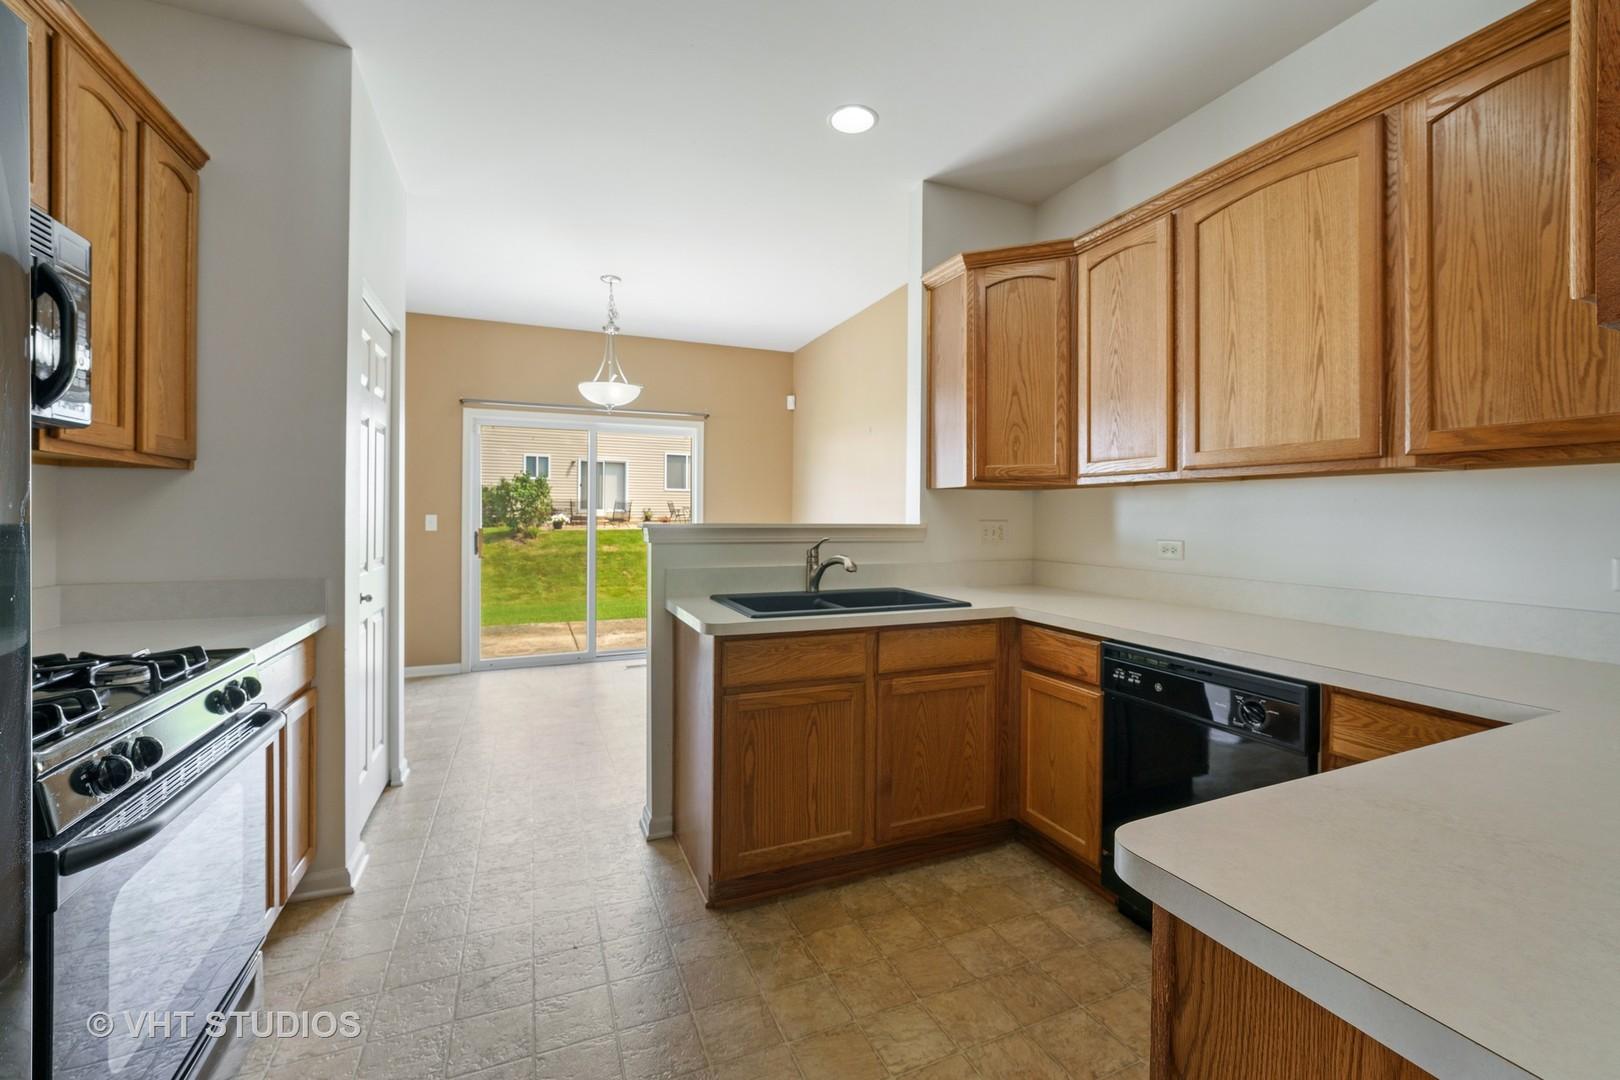 8203 Woodview Avenue, Joliet, Illinois 60431, 2 Bedrooms Bedrooms, ,2 BathroomsBathrooms,Residential,For Sale,Woodview,MRD11151541